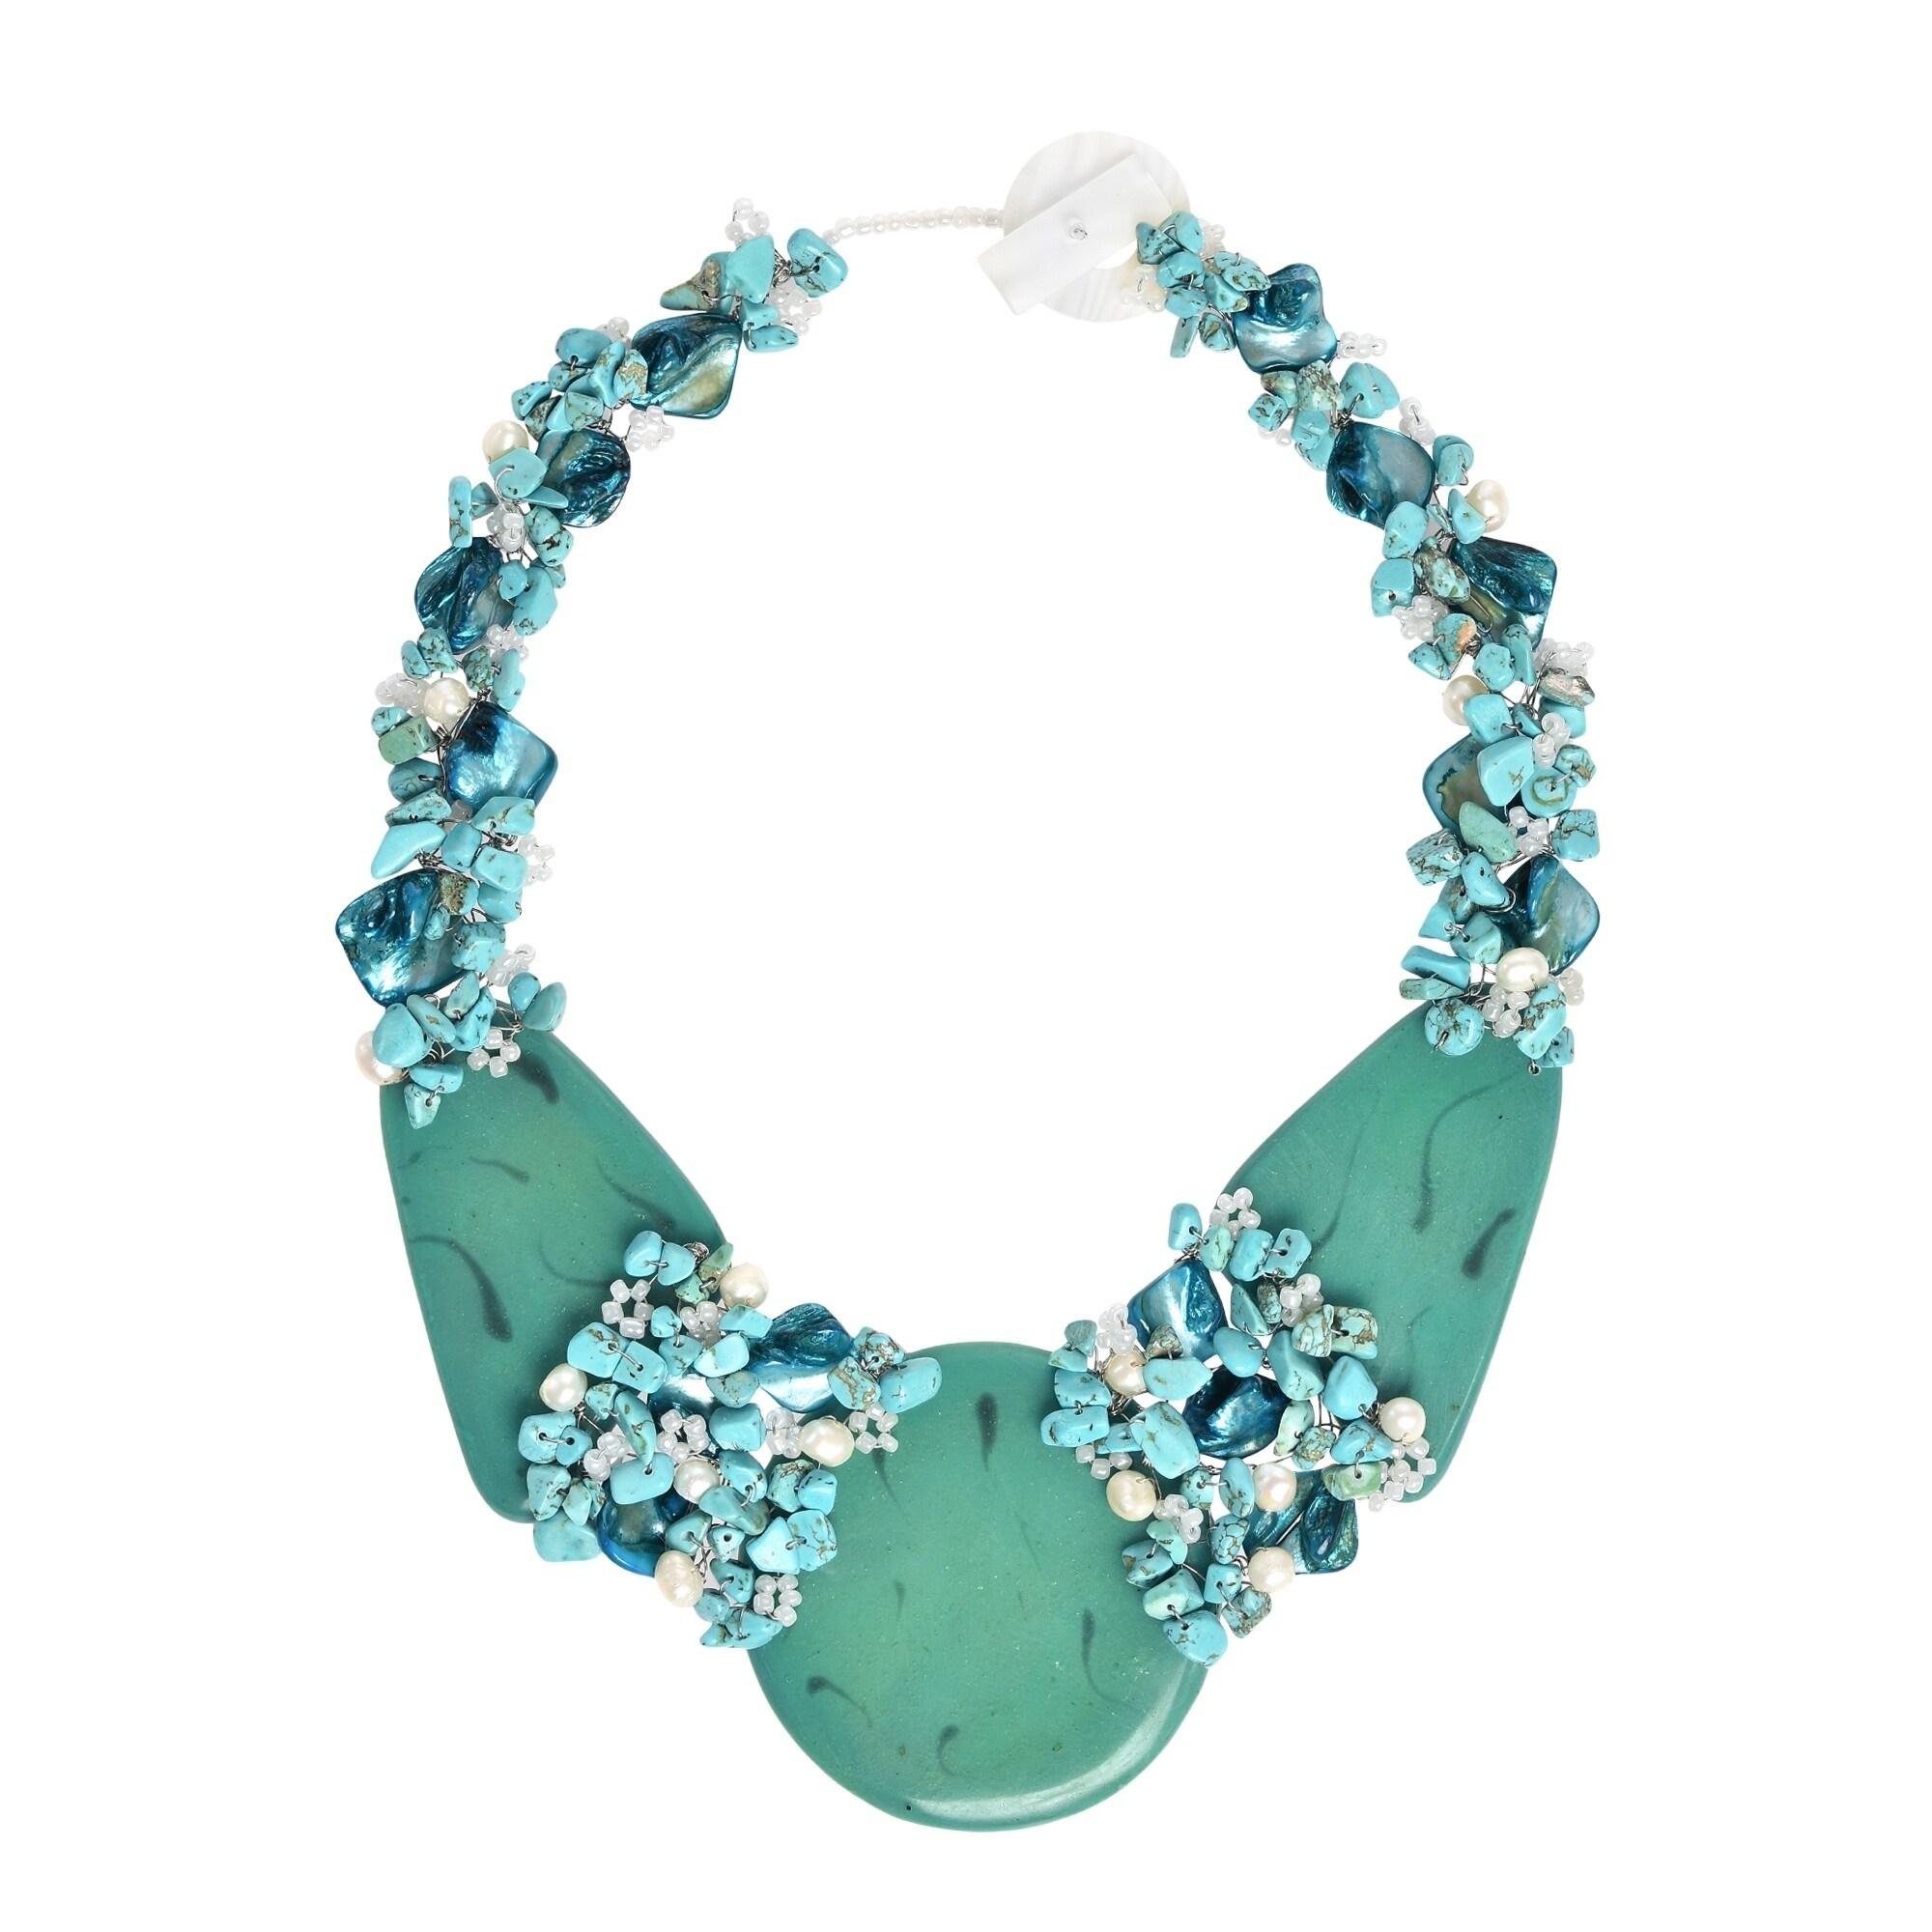 Shop Handmade Mystique Moon Stone Slab Statement Necklace ...